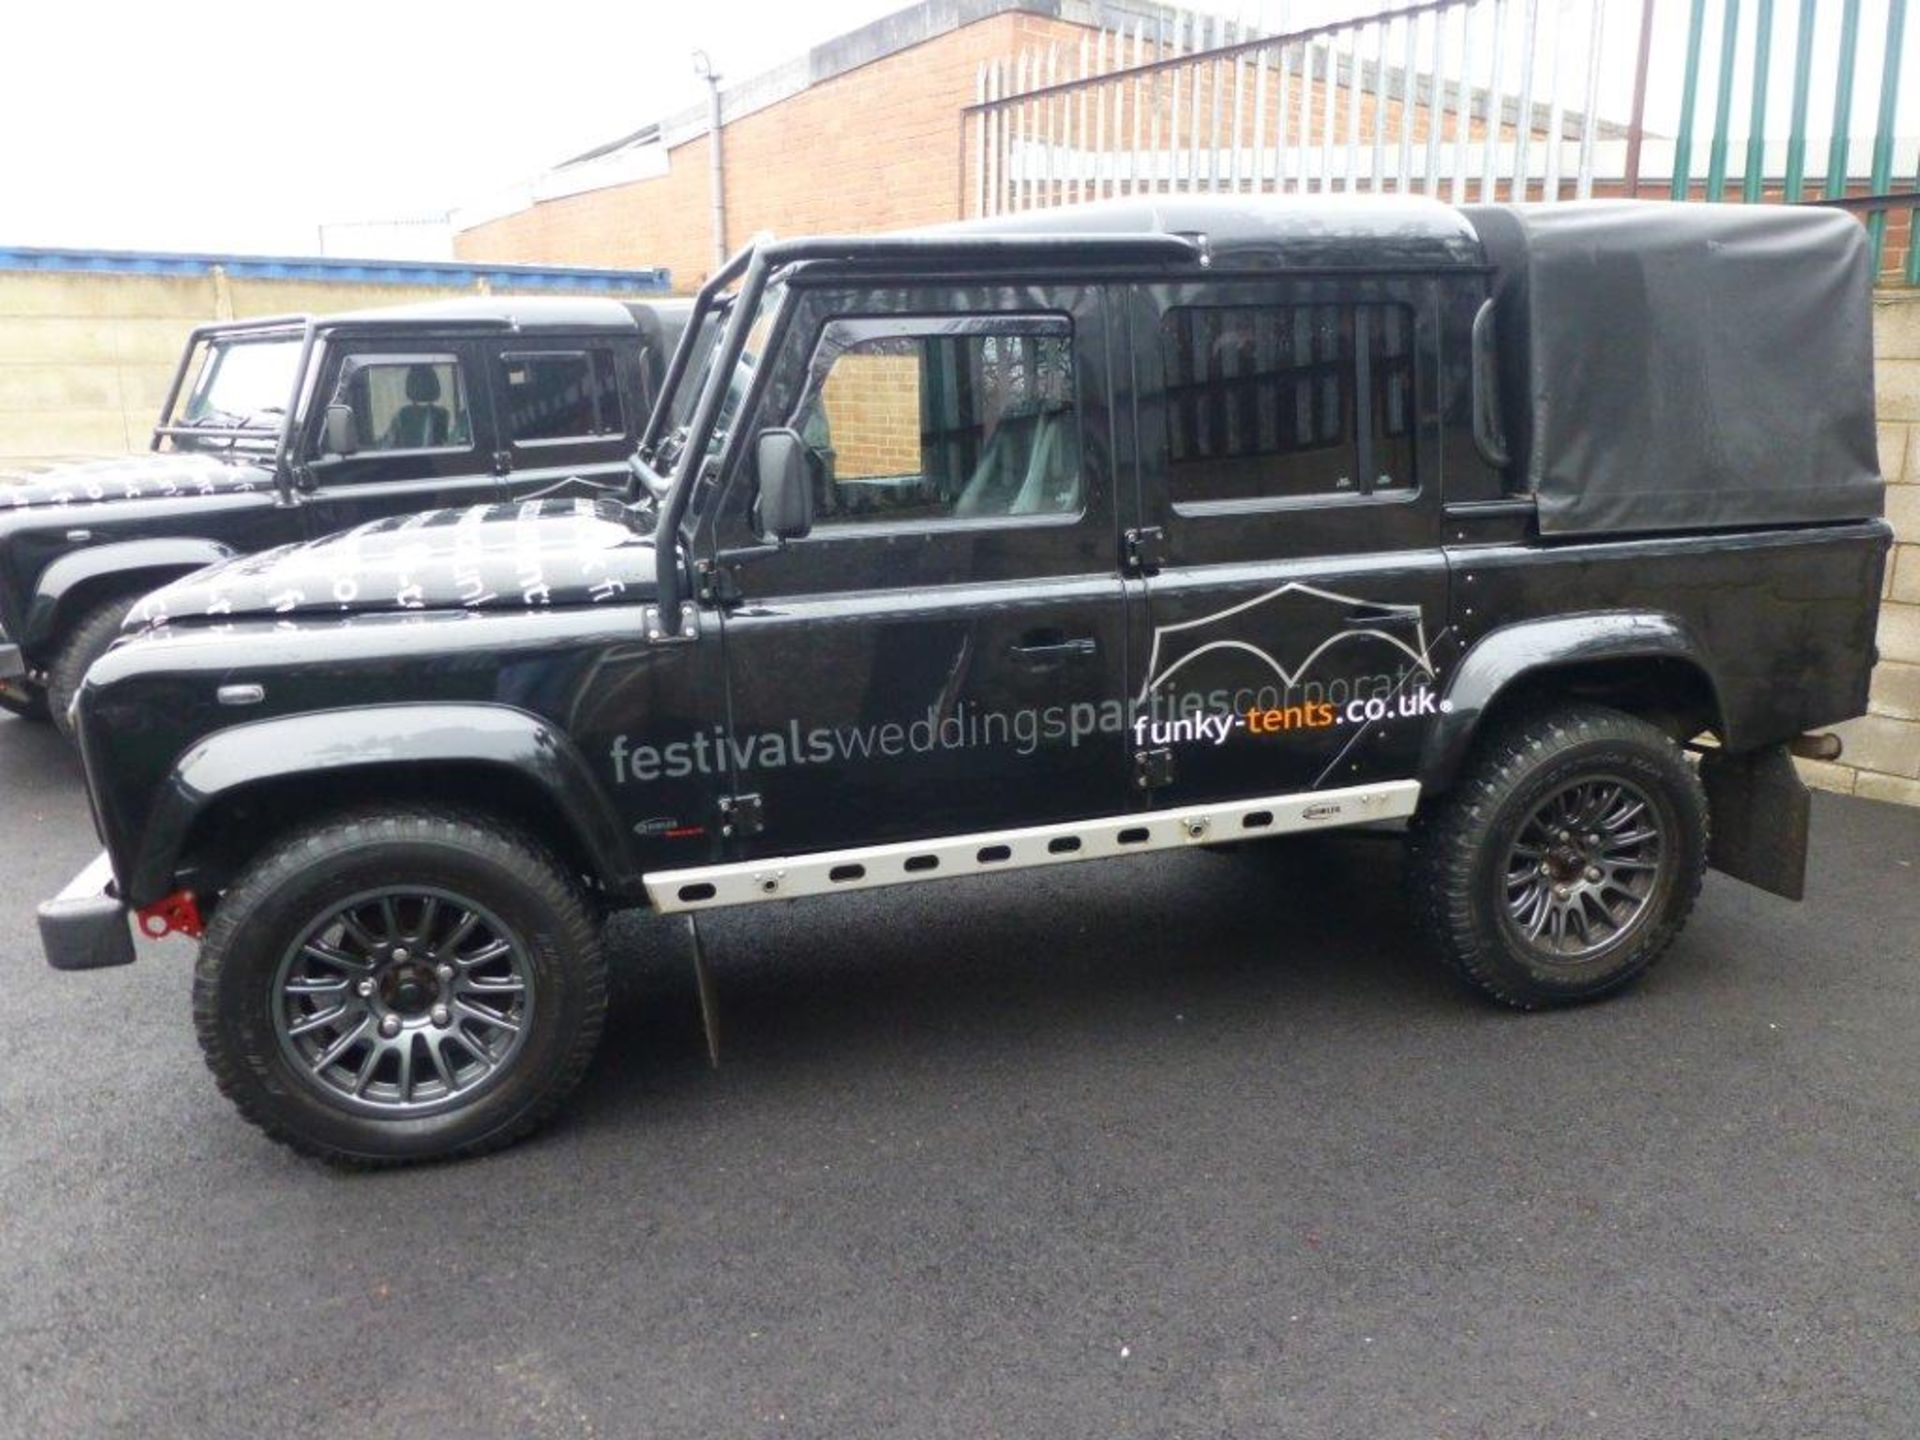 Land Rover Defender 110 XS Bowler double cab pickup TDCi (2.2). Reg no. T9 FNK. Reg. date 23/03/ - Image 3 of 13